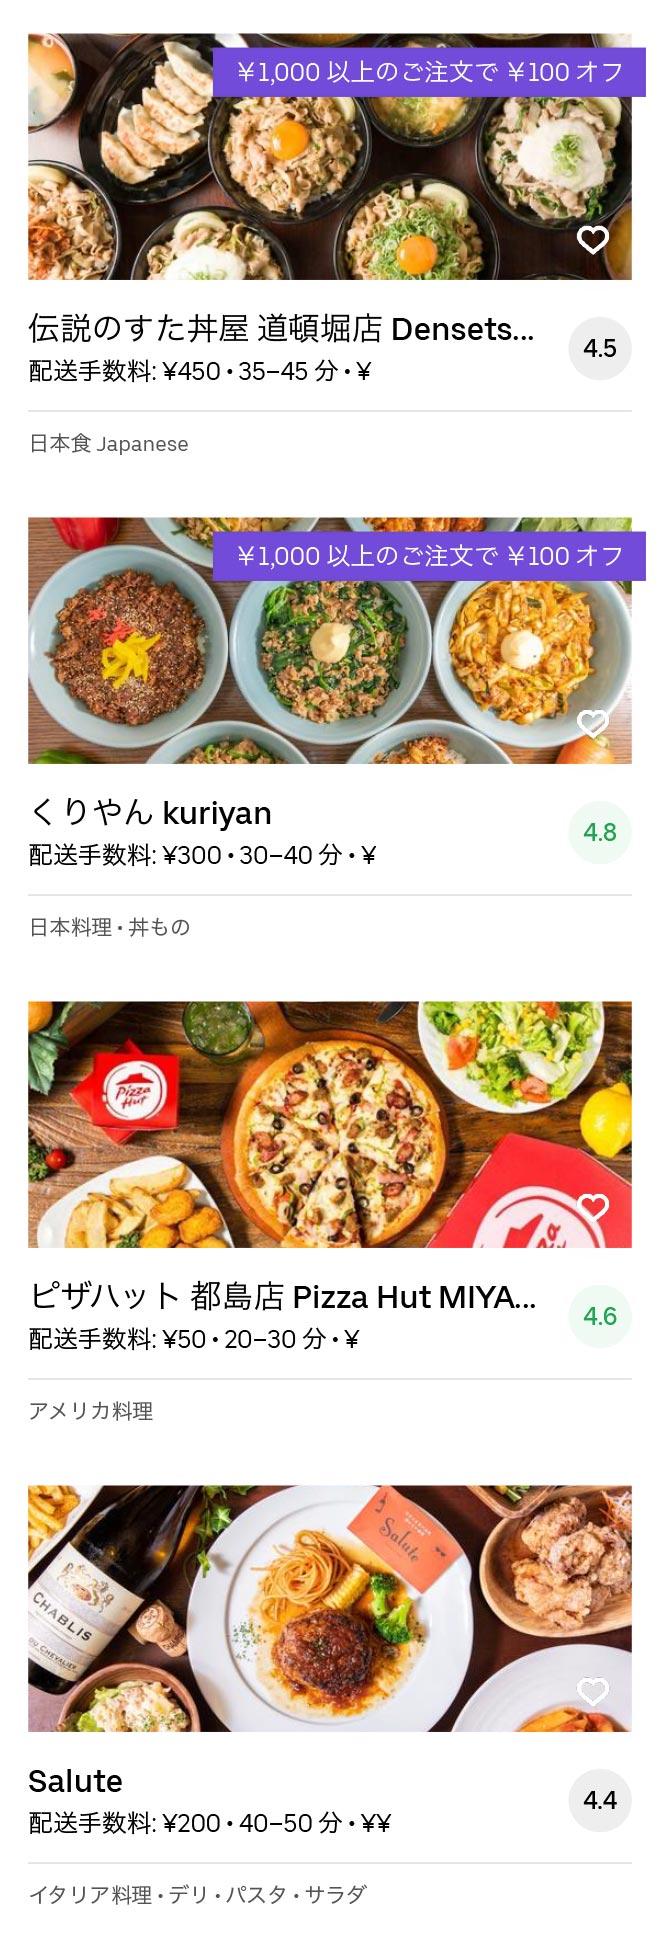 Osaka kyobashi menu 2005 11